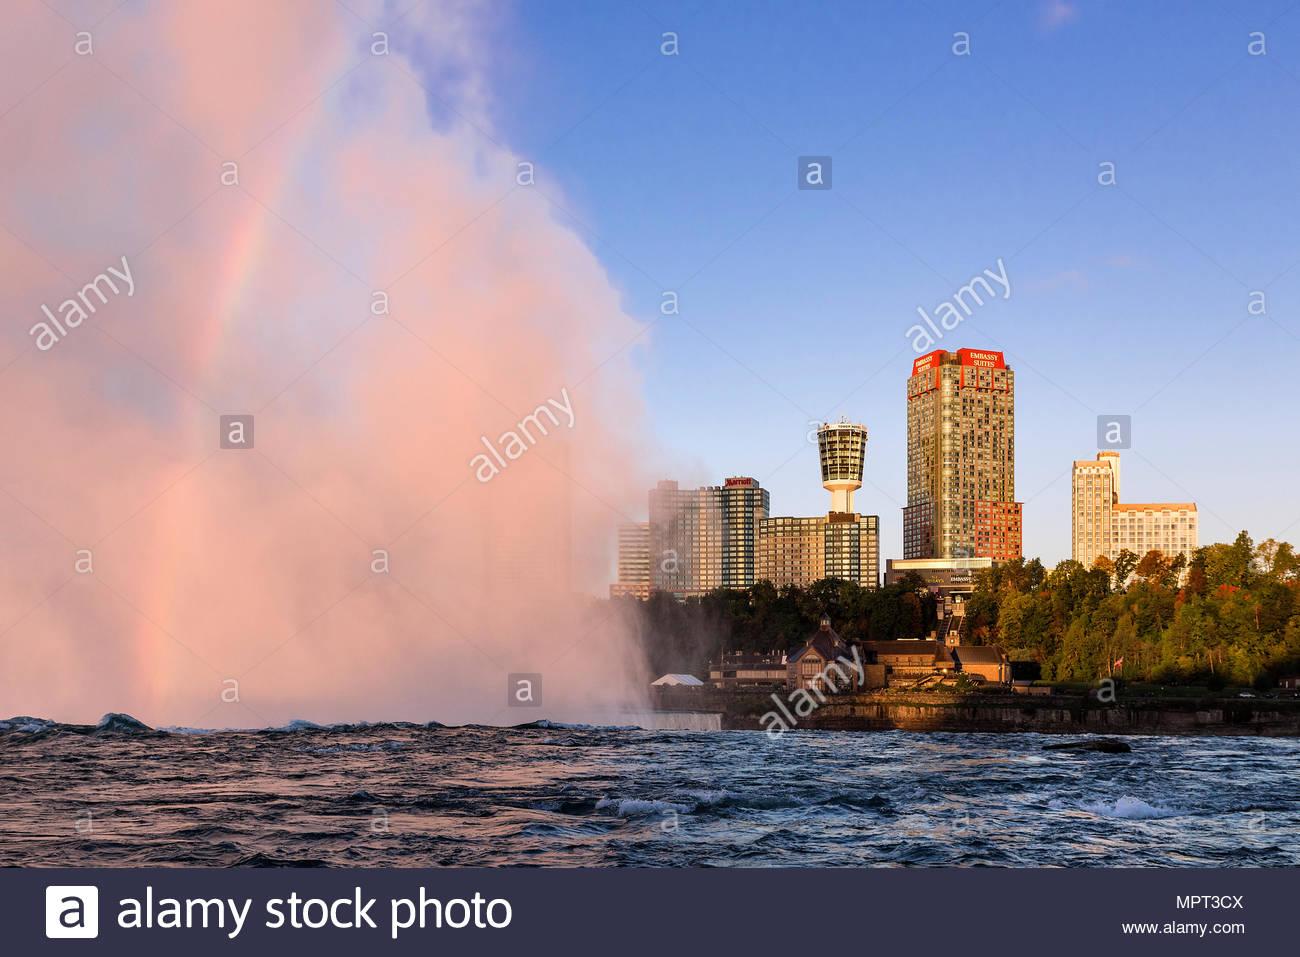 Horseshoe Fall and city skyline, Niagara Falls, Ontario, Canada. - Stock Image